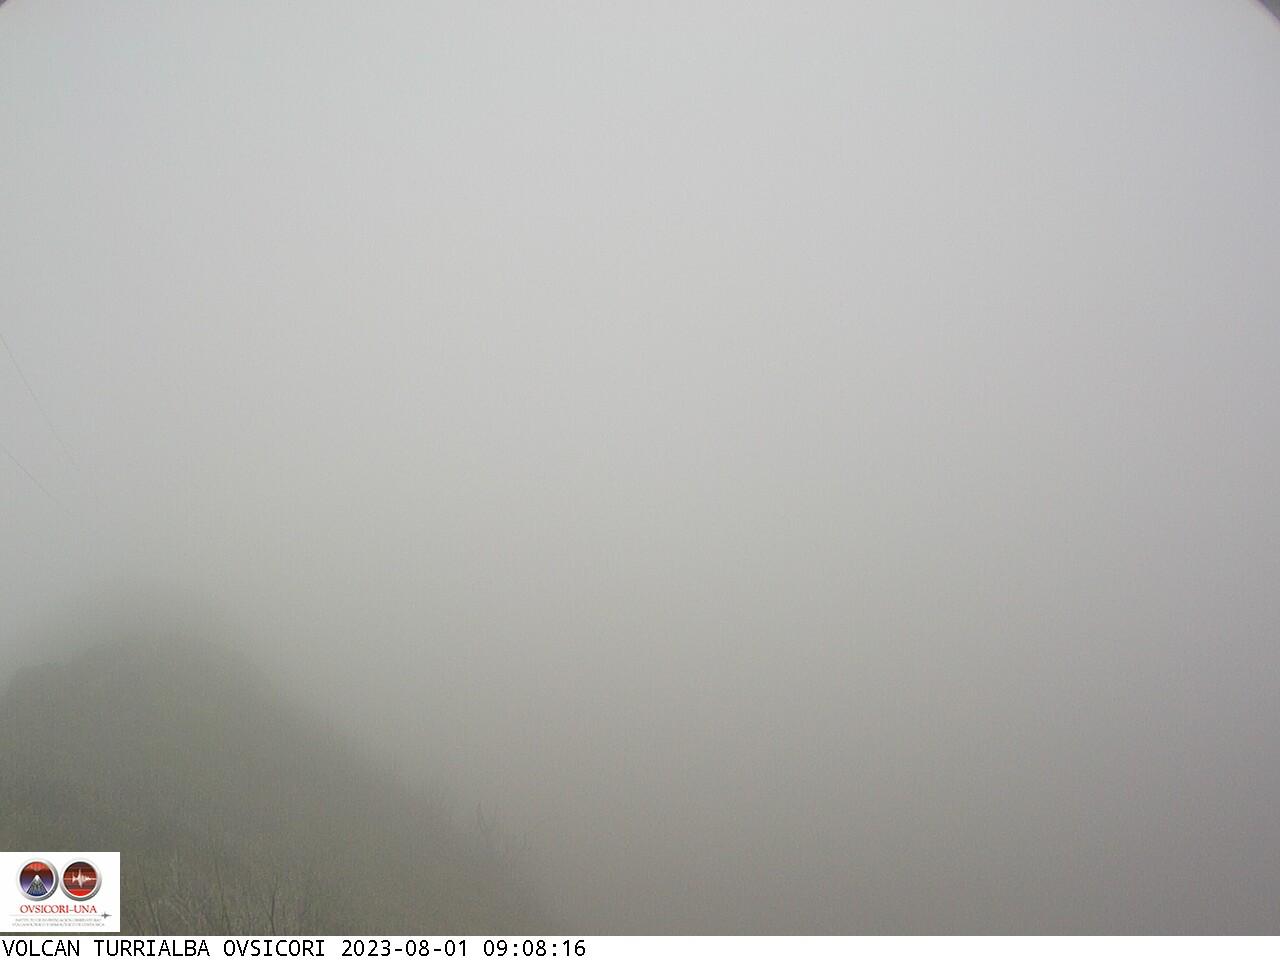 Volcano Turrialba Sun. 09:08